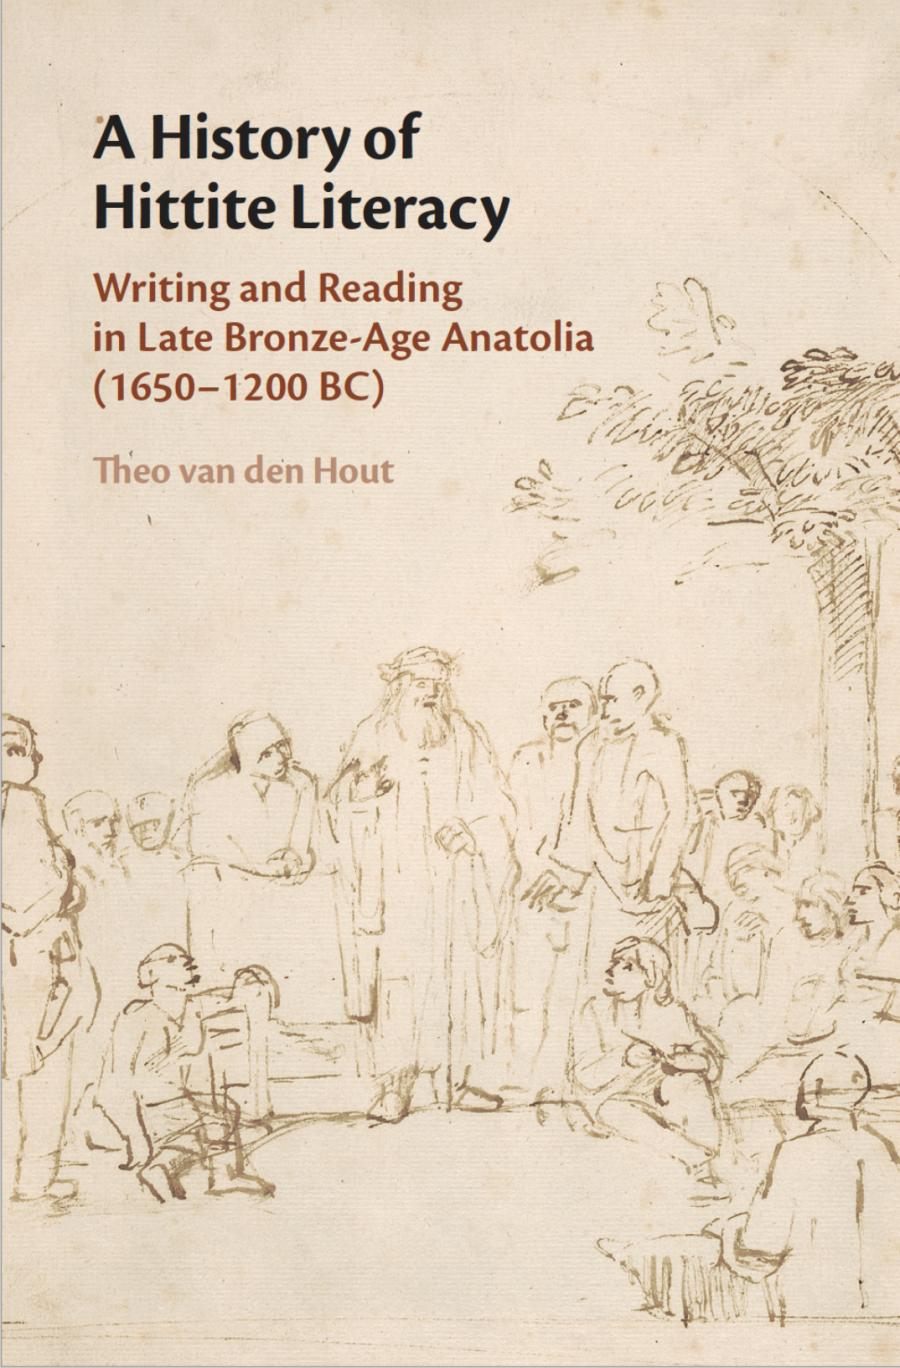 Hittite Literacy